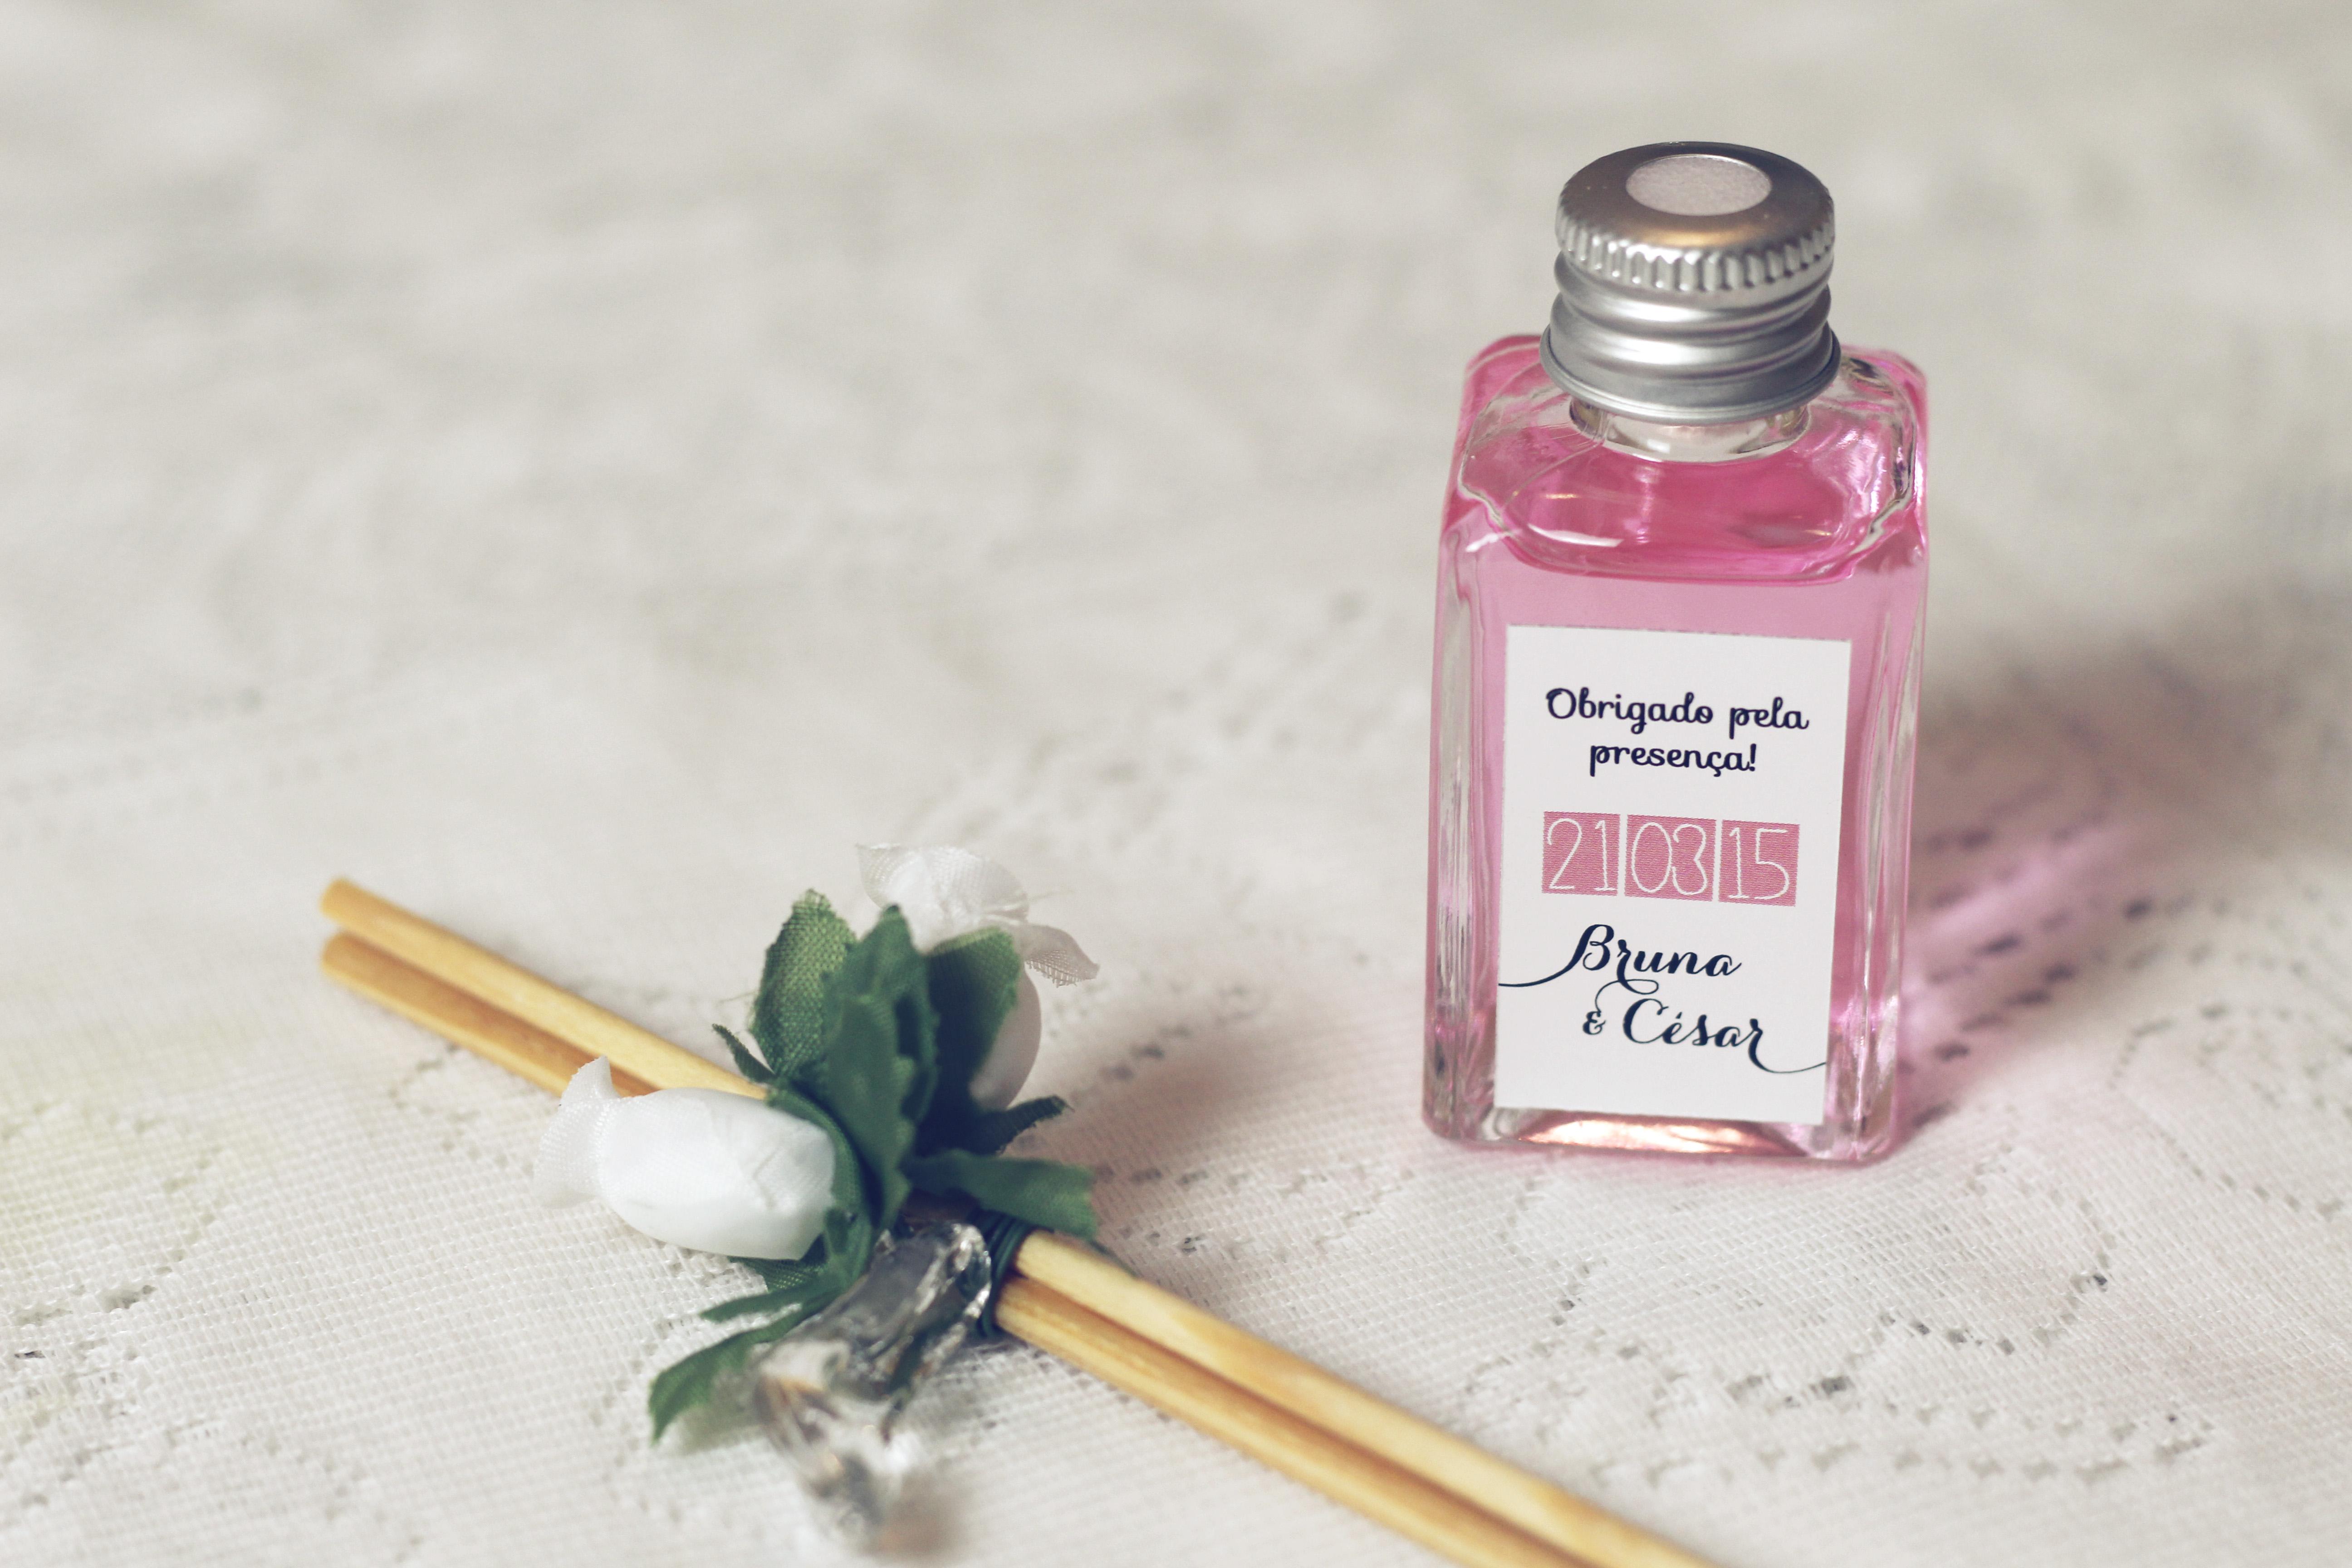 difusor de ambiente, lembrancinha de casamento, bruna dalcin, noiva, presente, casamento, difusores, perfume